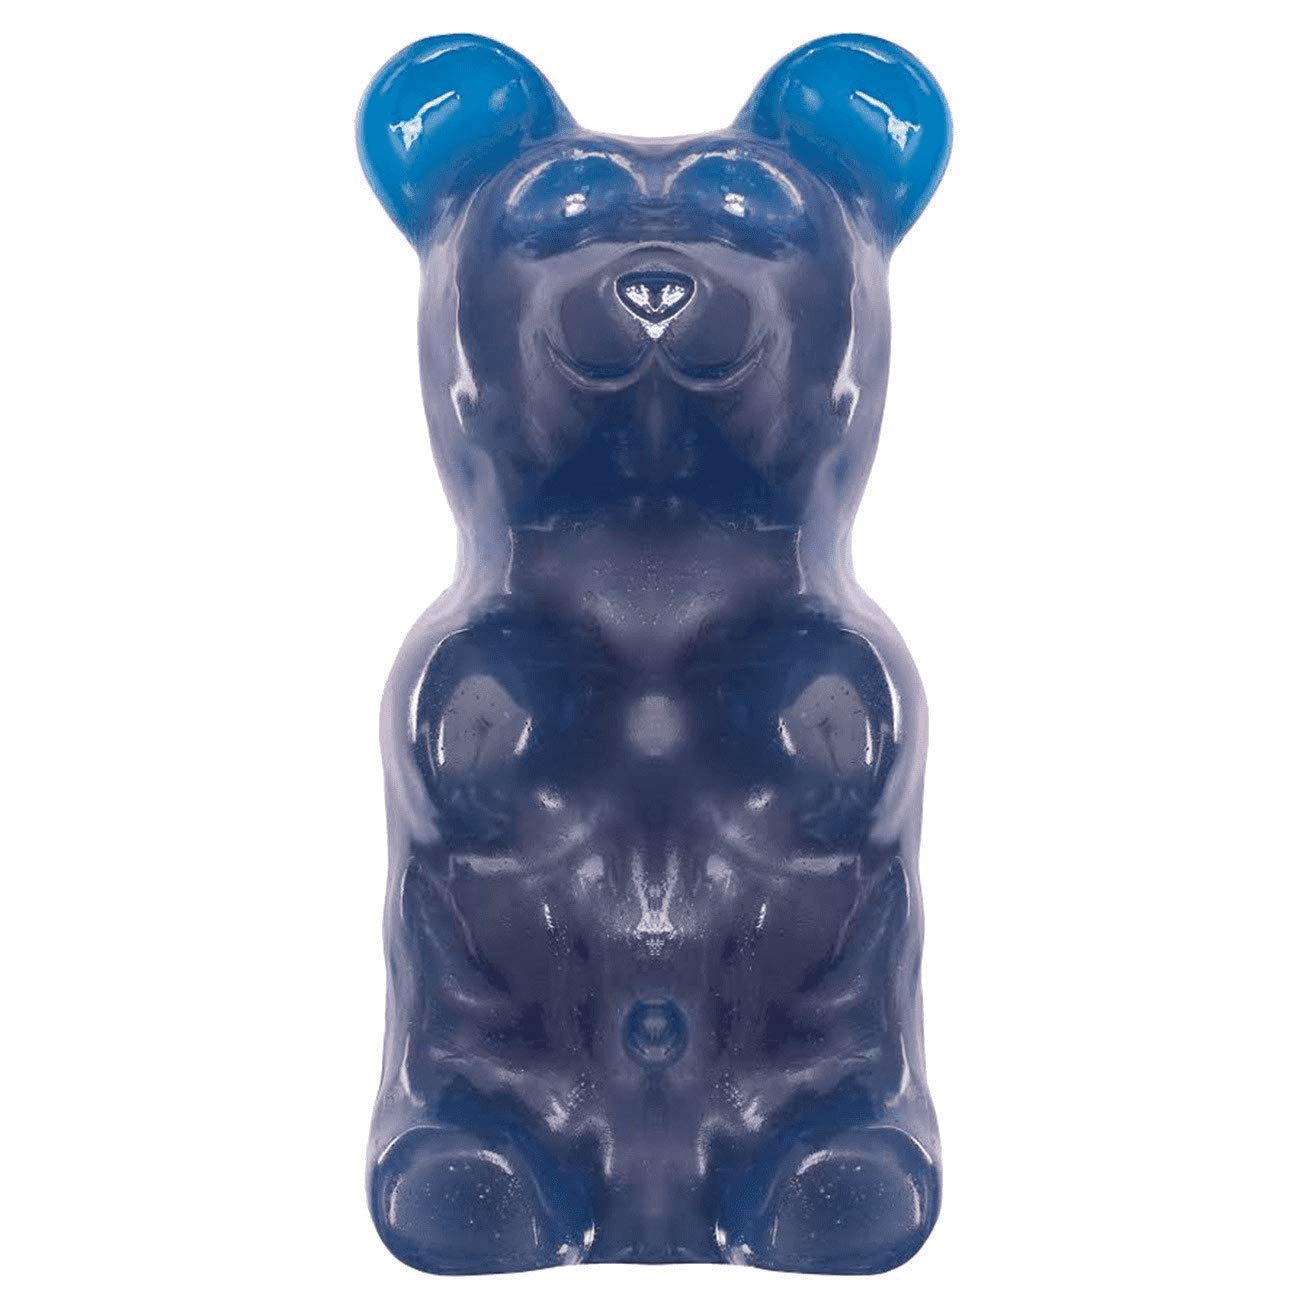 World's Largest Gummy Bear, Approx 5-pounds Giant Gummy Bear - Blue Raspberry